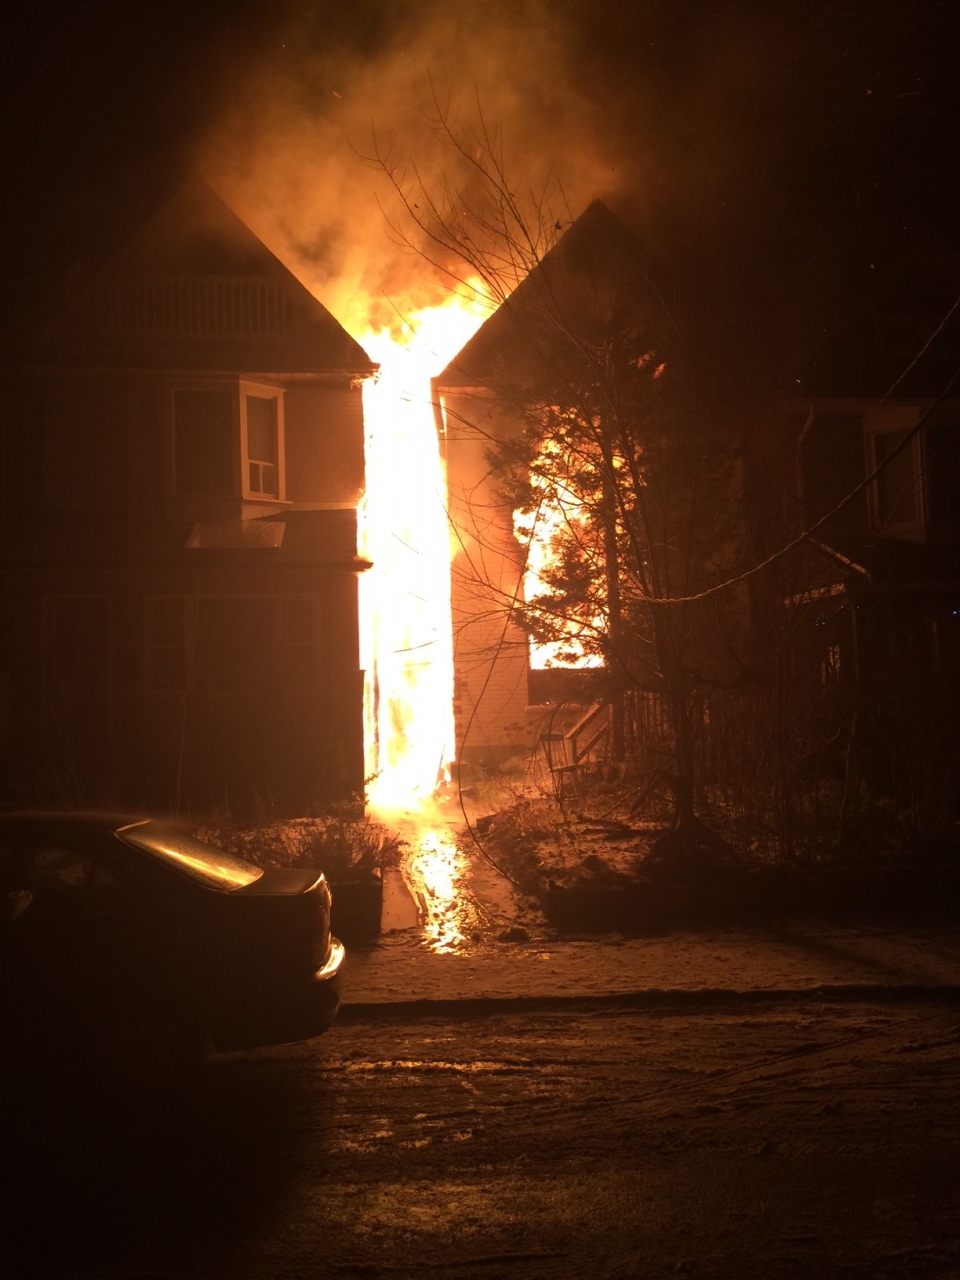 Elderly Woman Likely Died In Her Sleep As Fire Ravaged Her